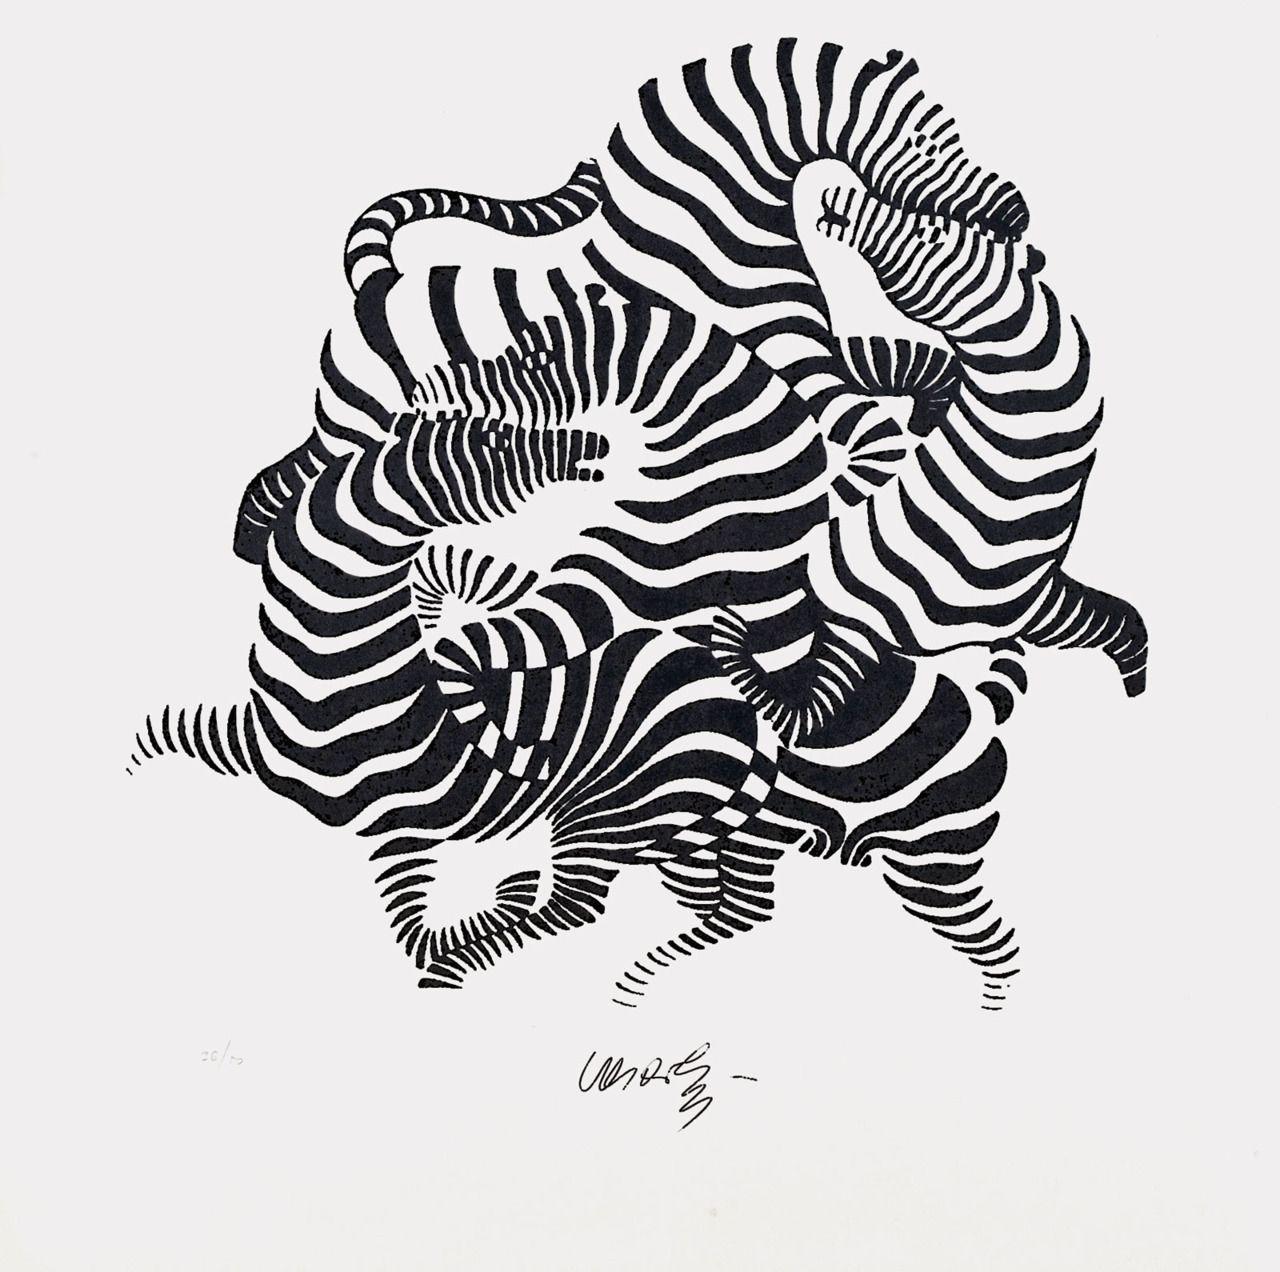 Framed Canvas Street  graffiti Urban  Art Print zebra stripes victor varseley